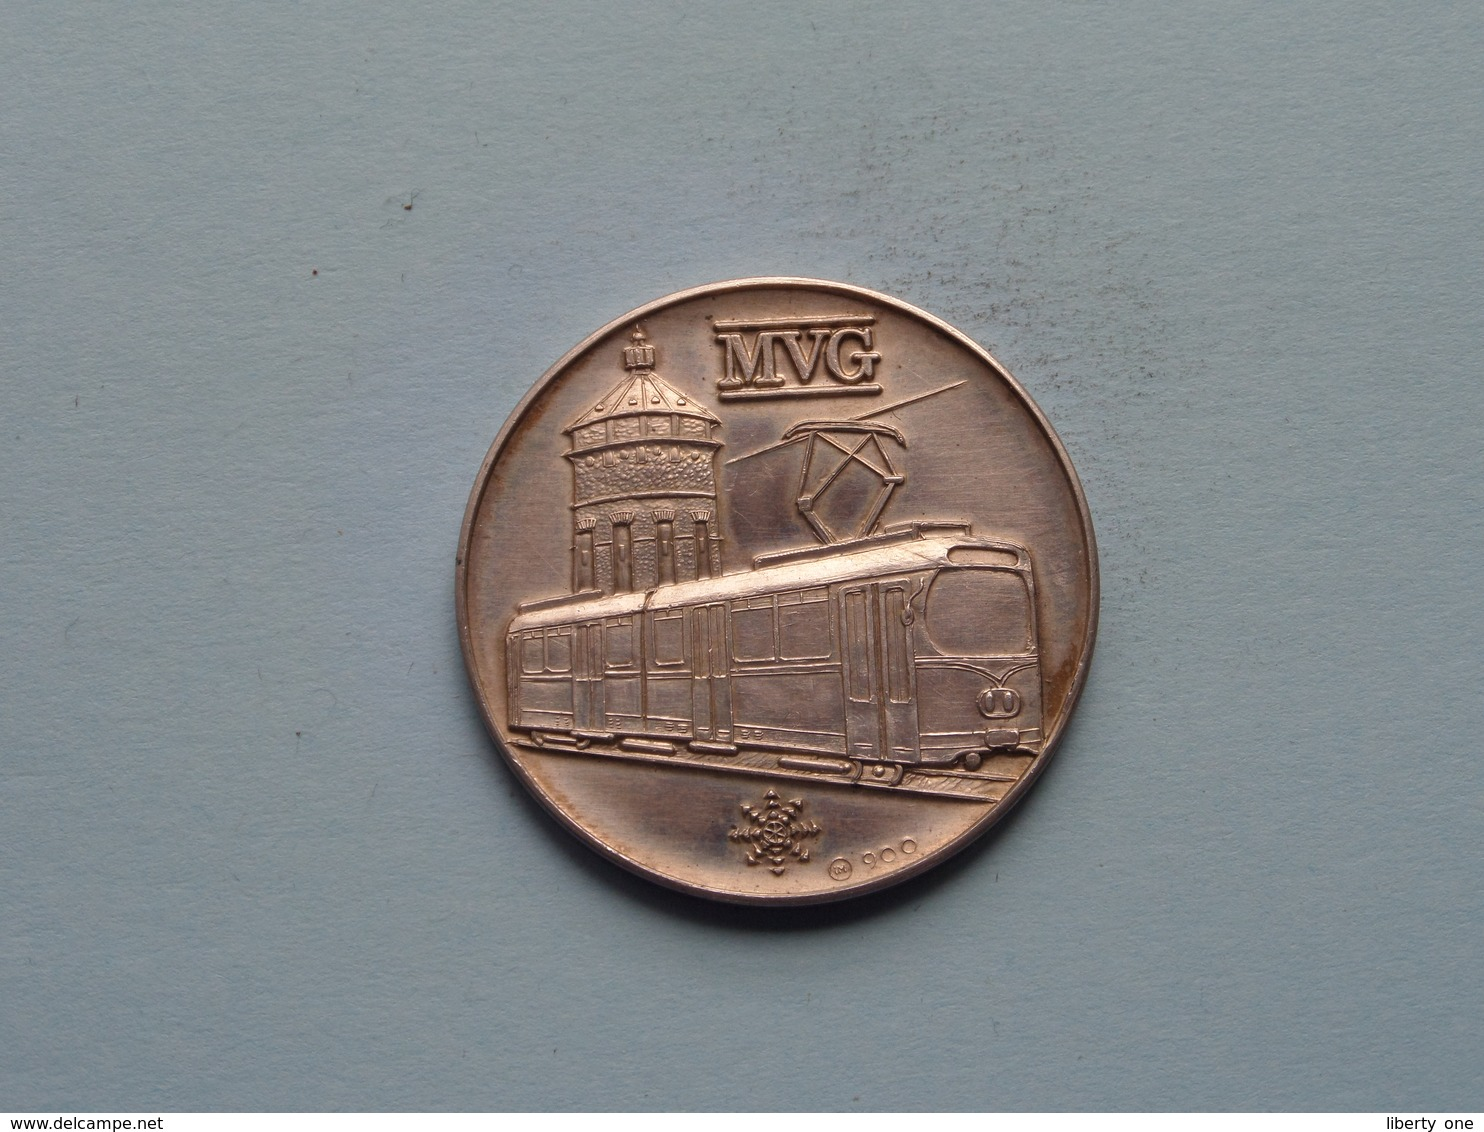 100 Jahre MANNHEIMER STRASSENBAHN 1878 / 1978 - MVG ( 35 Mm. - 14.6 Gr. Silber 900 ) > ( See Photo ) ! - Professionnels/De Société